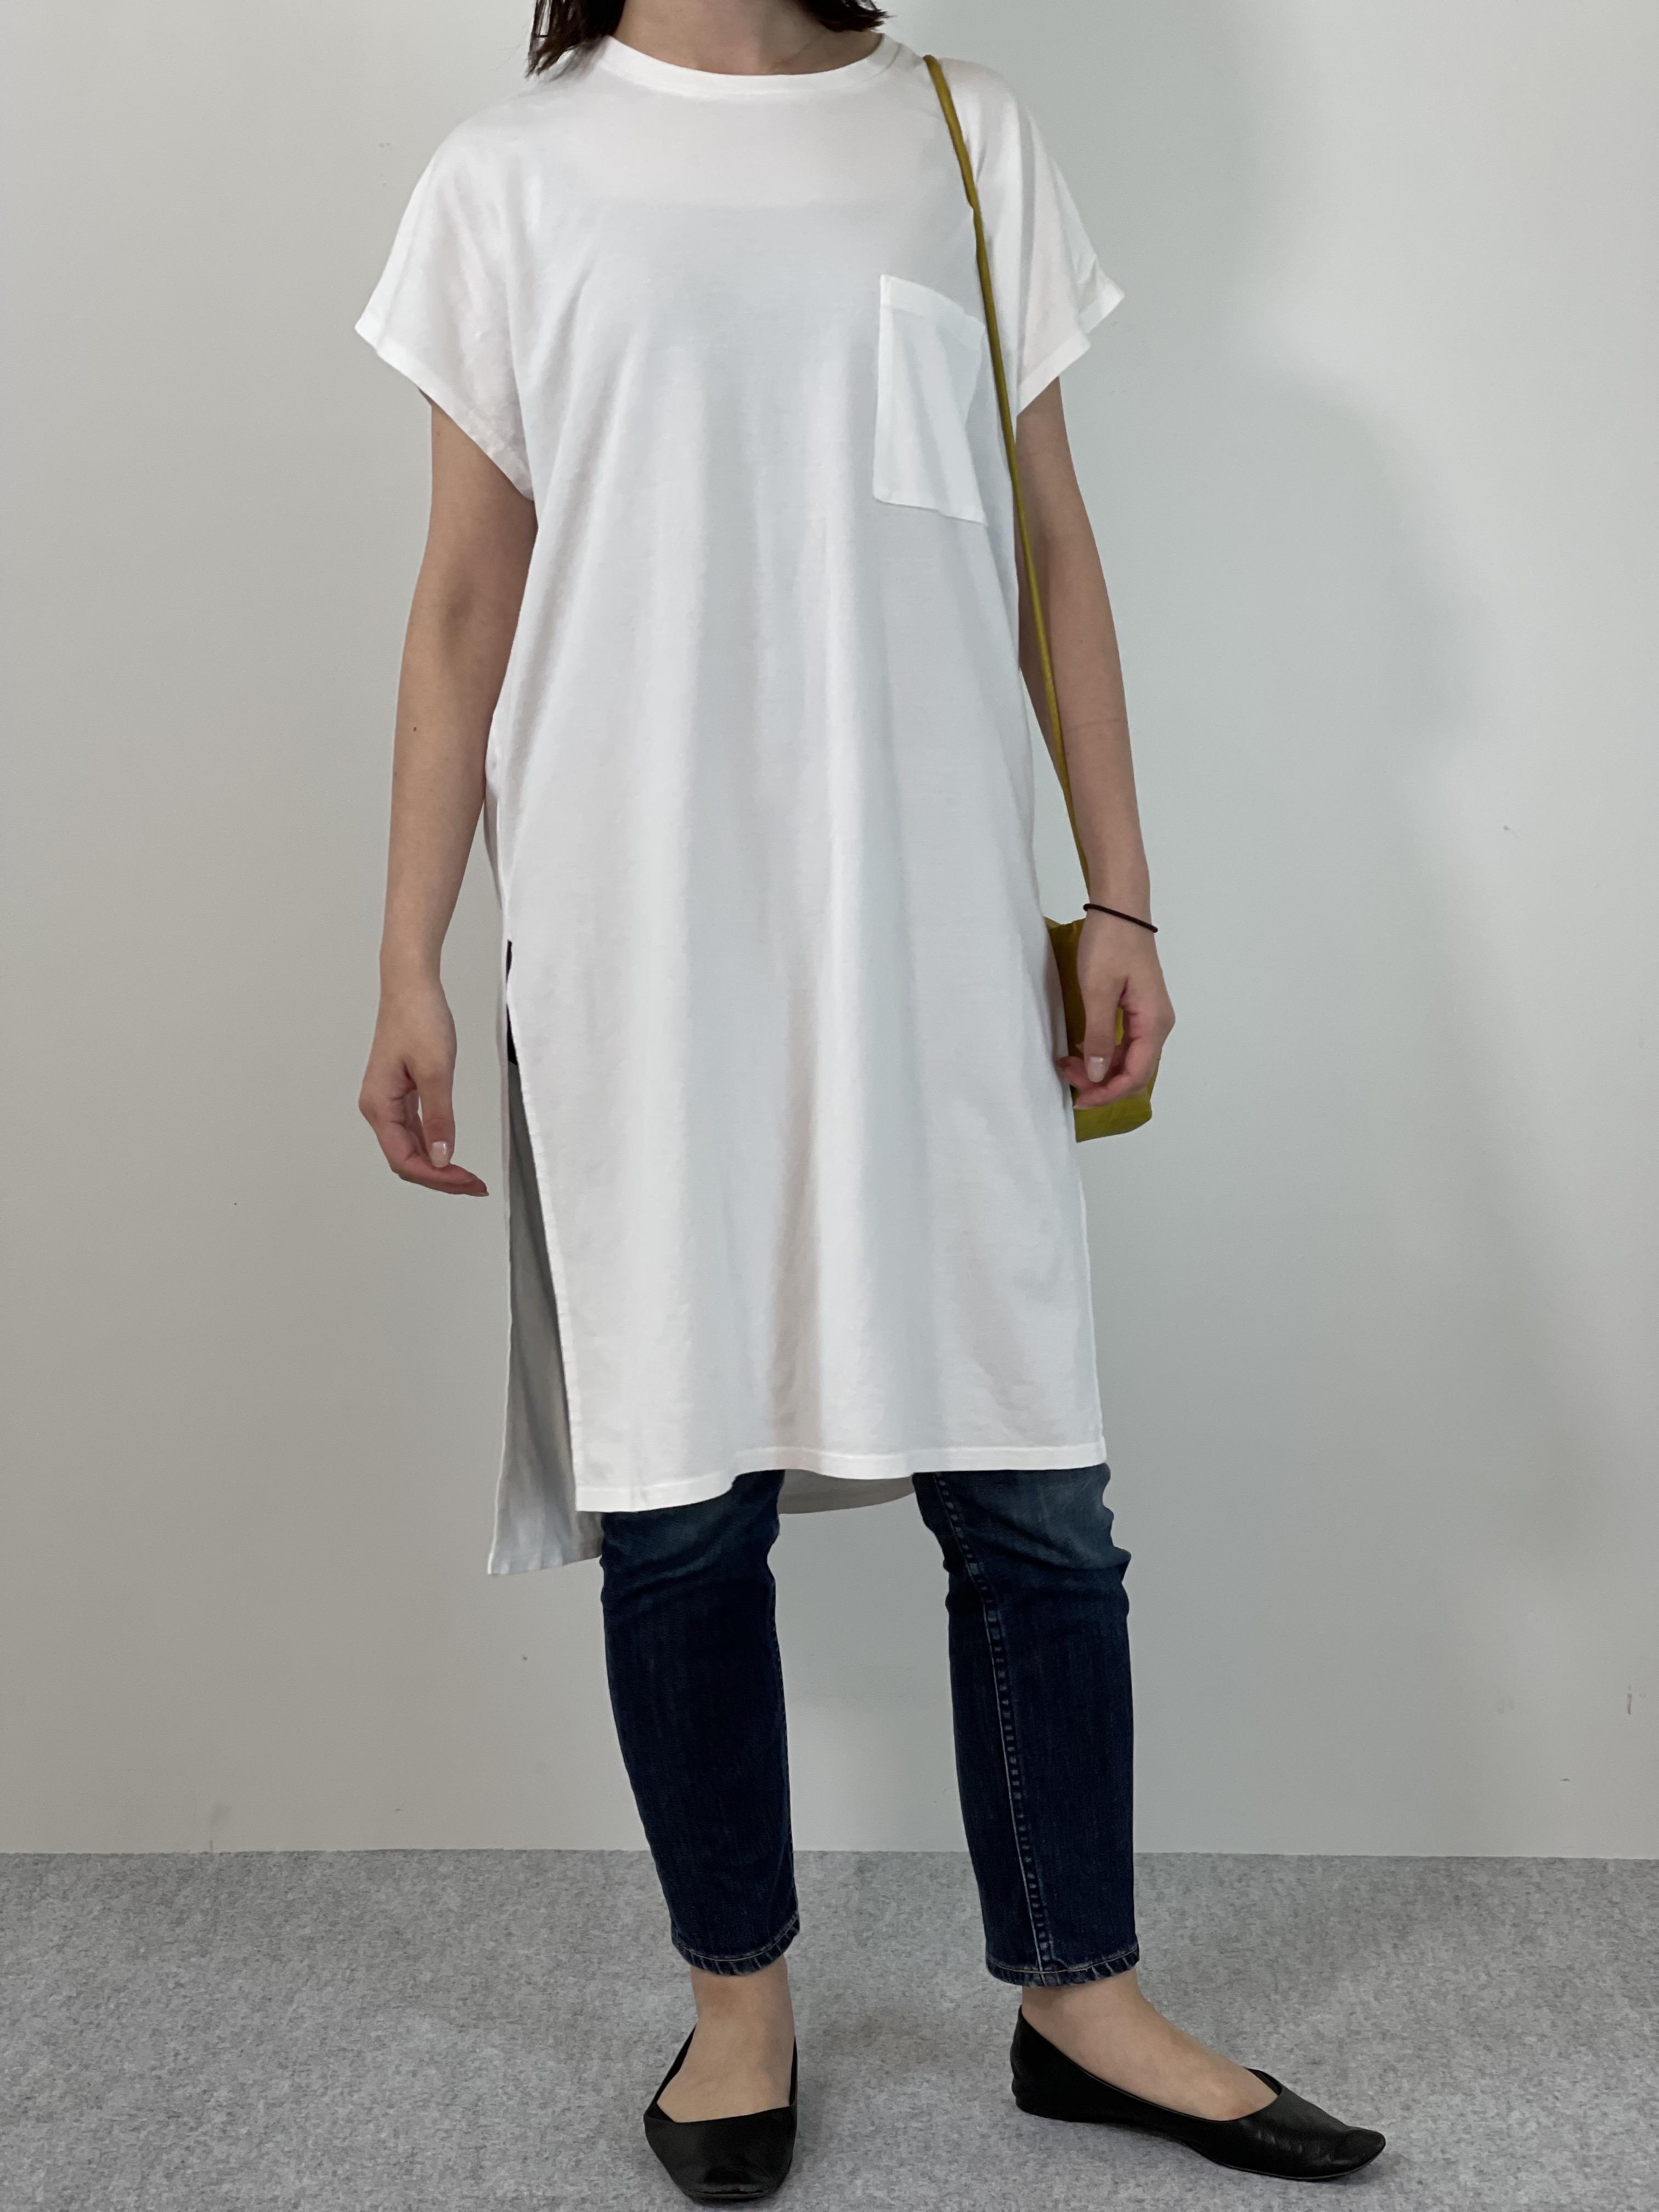 Women's COMFORT DRESS TUNIC T-SHIRTの着用画像1